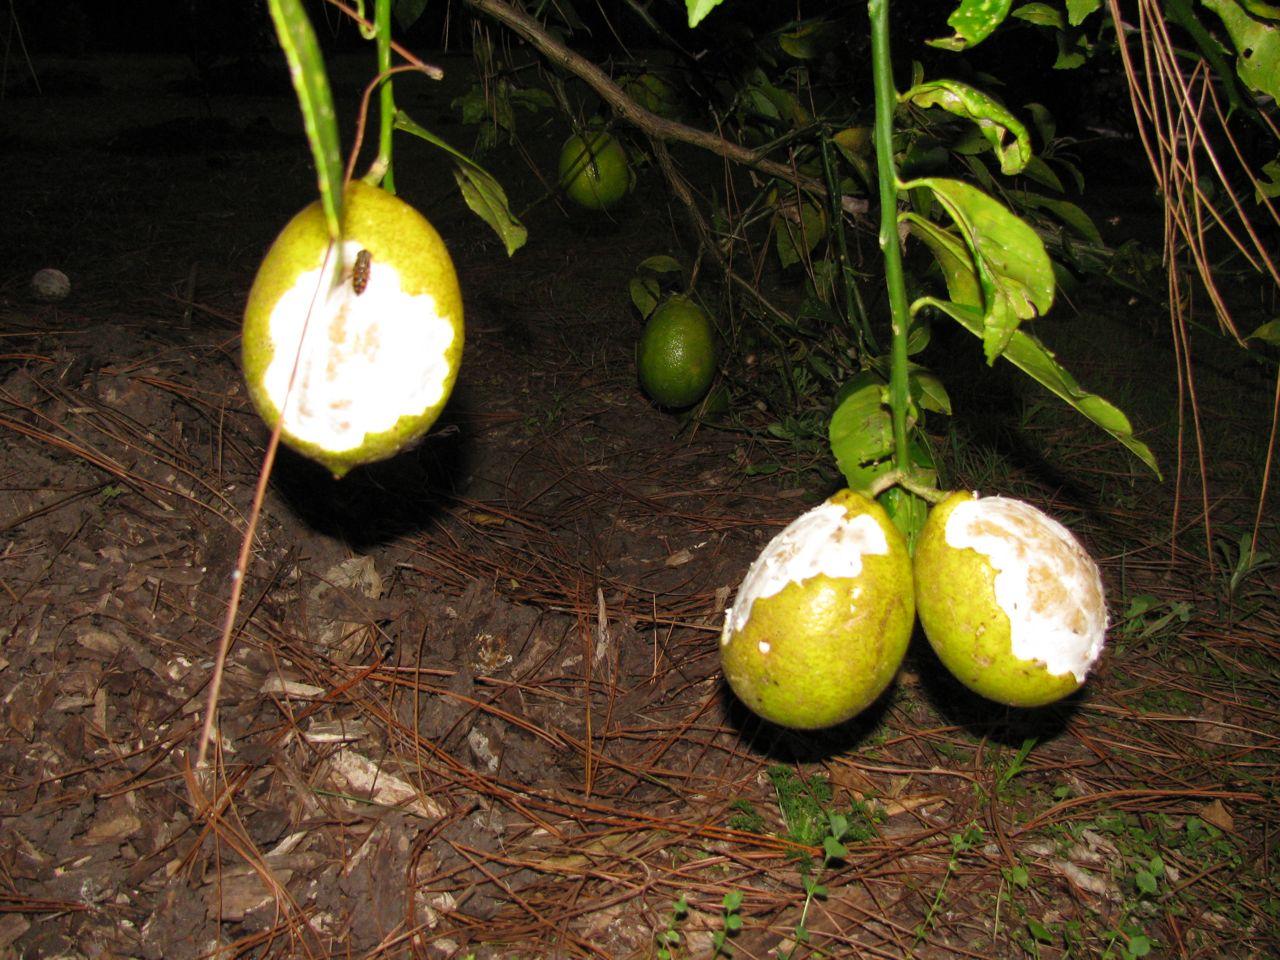 Mutterings from Maryville: Pesky possums lovin' lemons